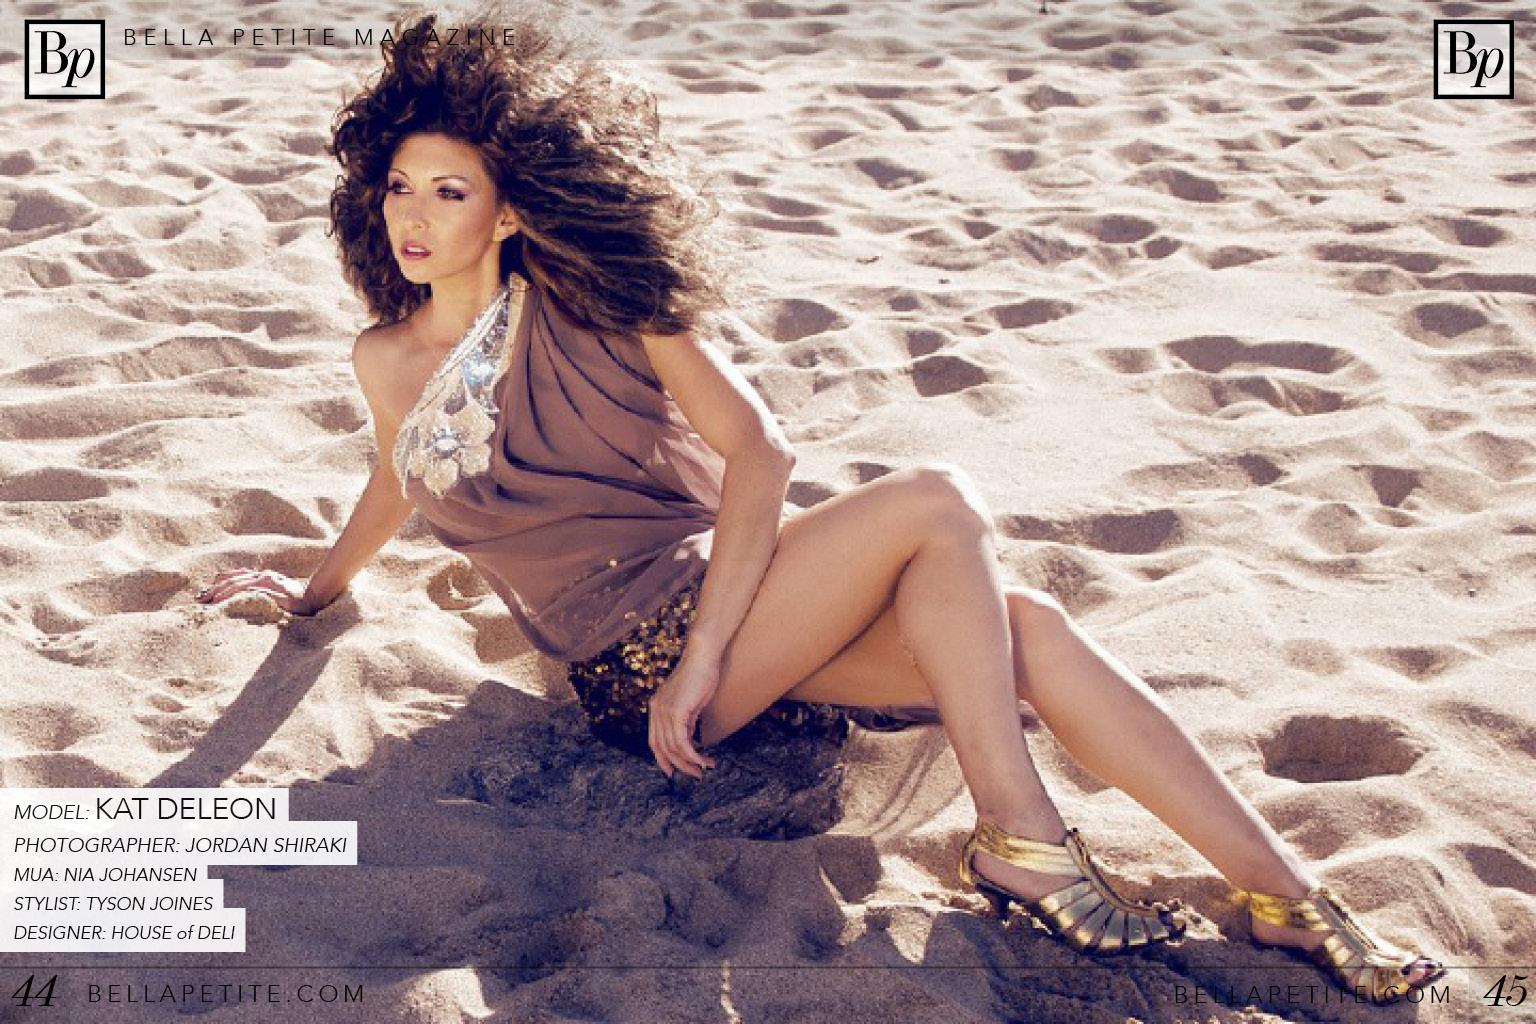 Ann Lauren Fresh Faces Bella Petite Model Kat Deleon